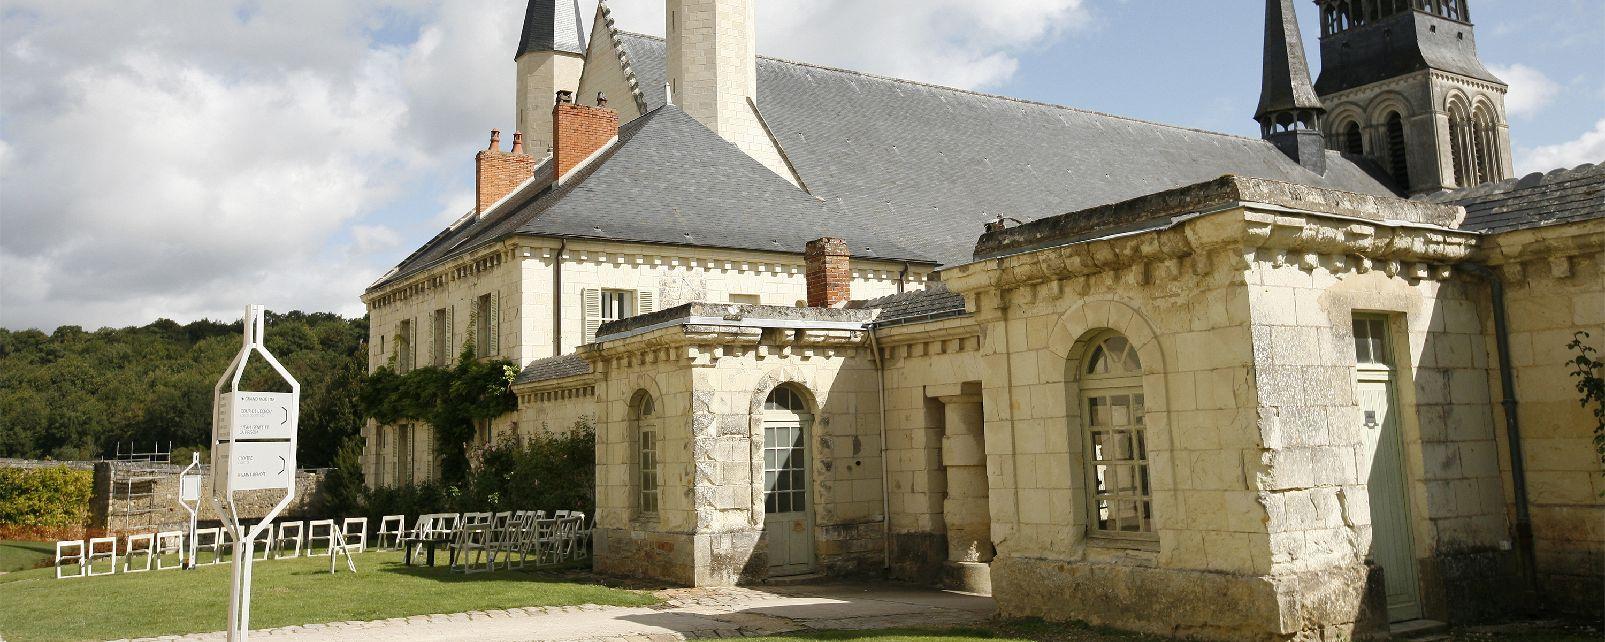 h tel abbaye royale de fontevraud fontevraud l 39 abbaye. Black Bedroom Furniture Sets. Home Design Ideas